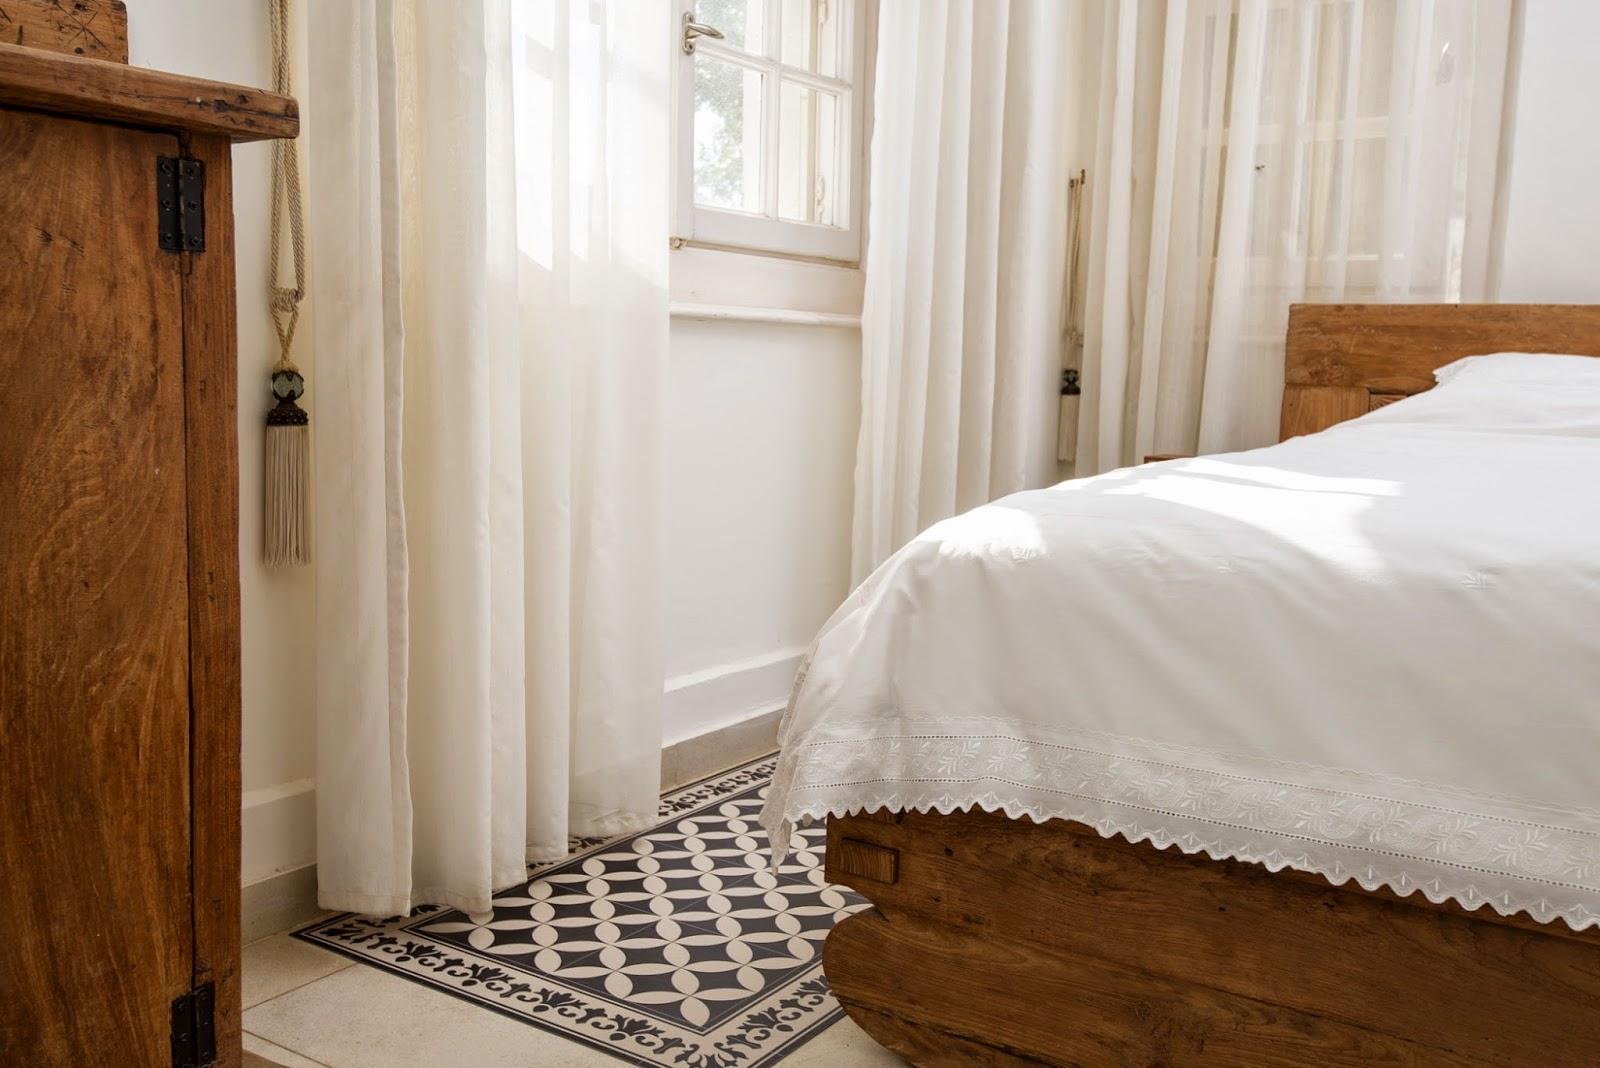 Retr and design tappeti in vinile beija flor per un for Tappeti beija flor